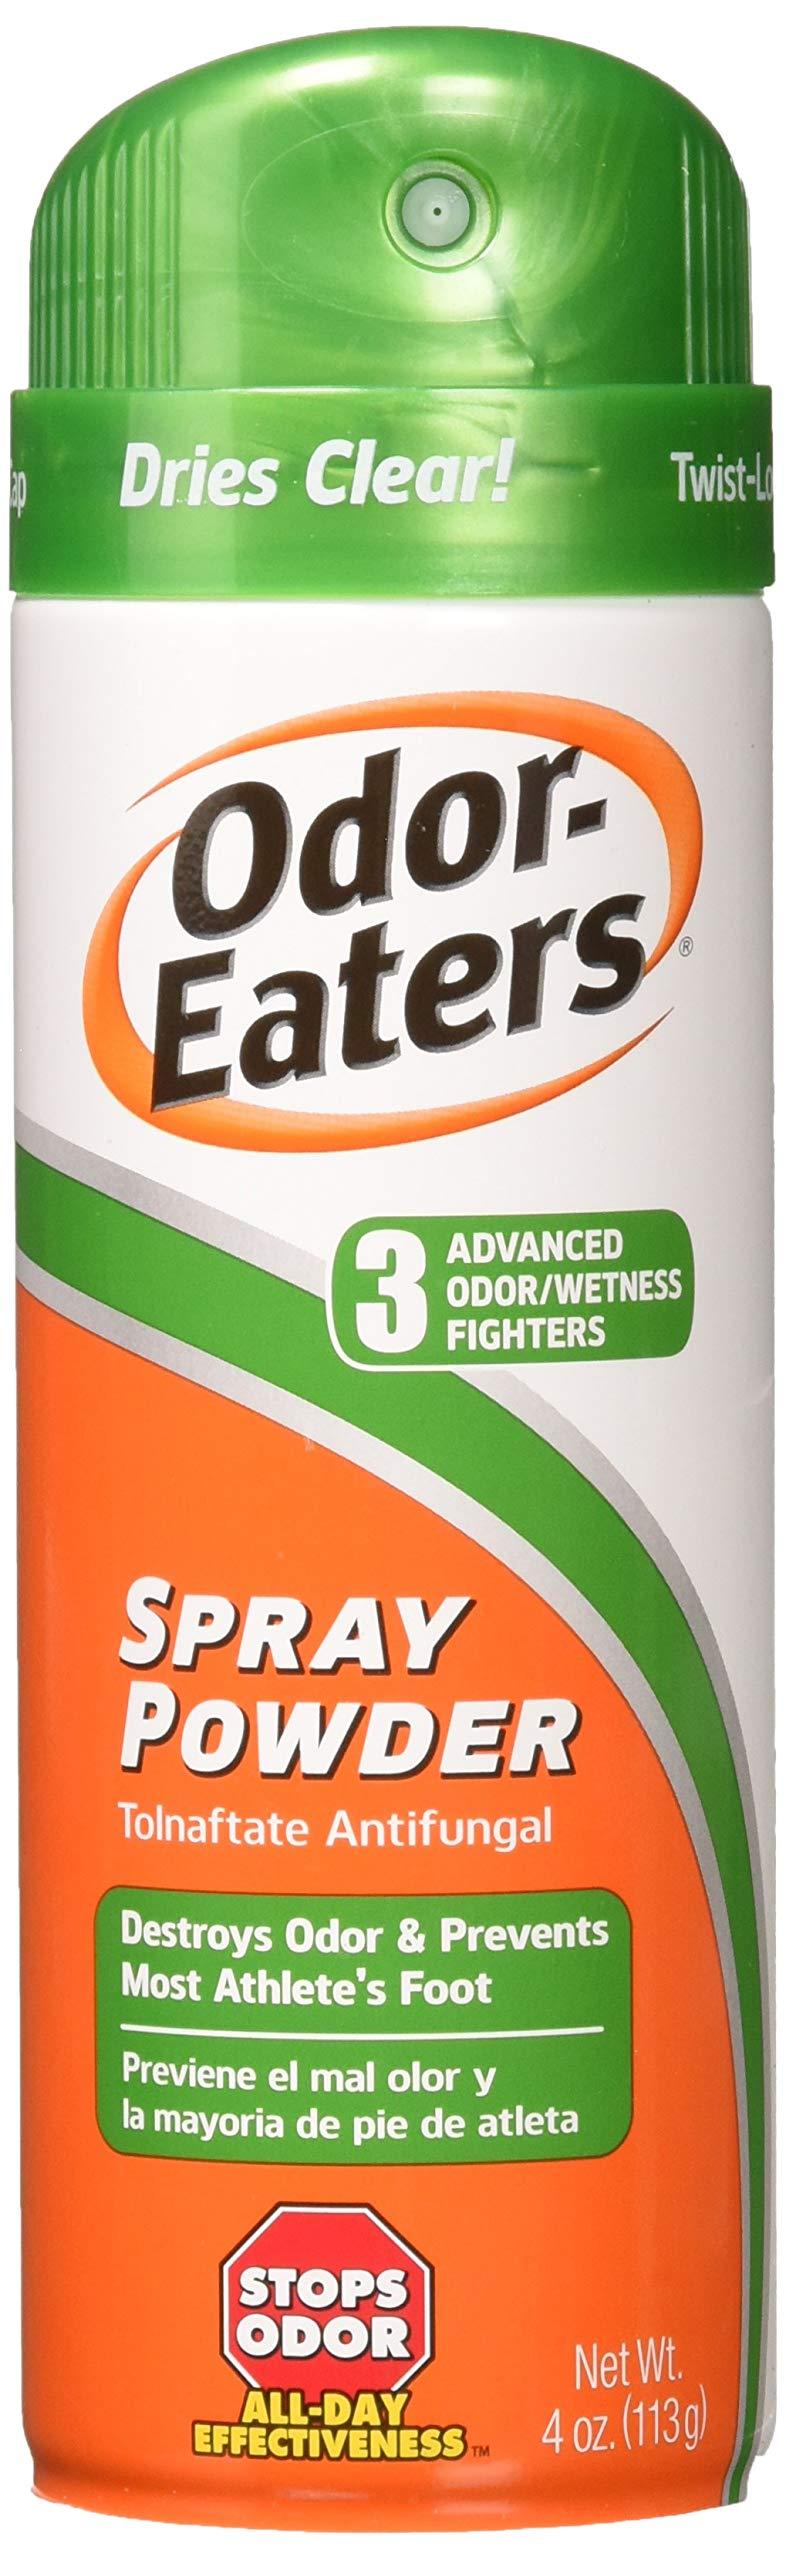 Odor-Eaters Foot Spray Powder, 4 oz, Pack of 2